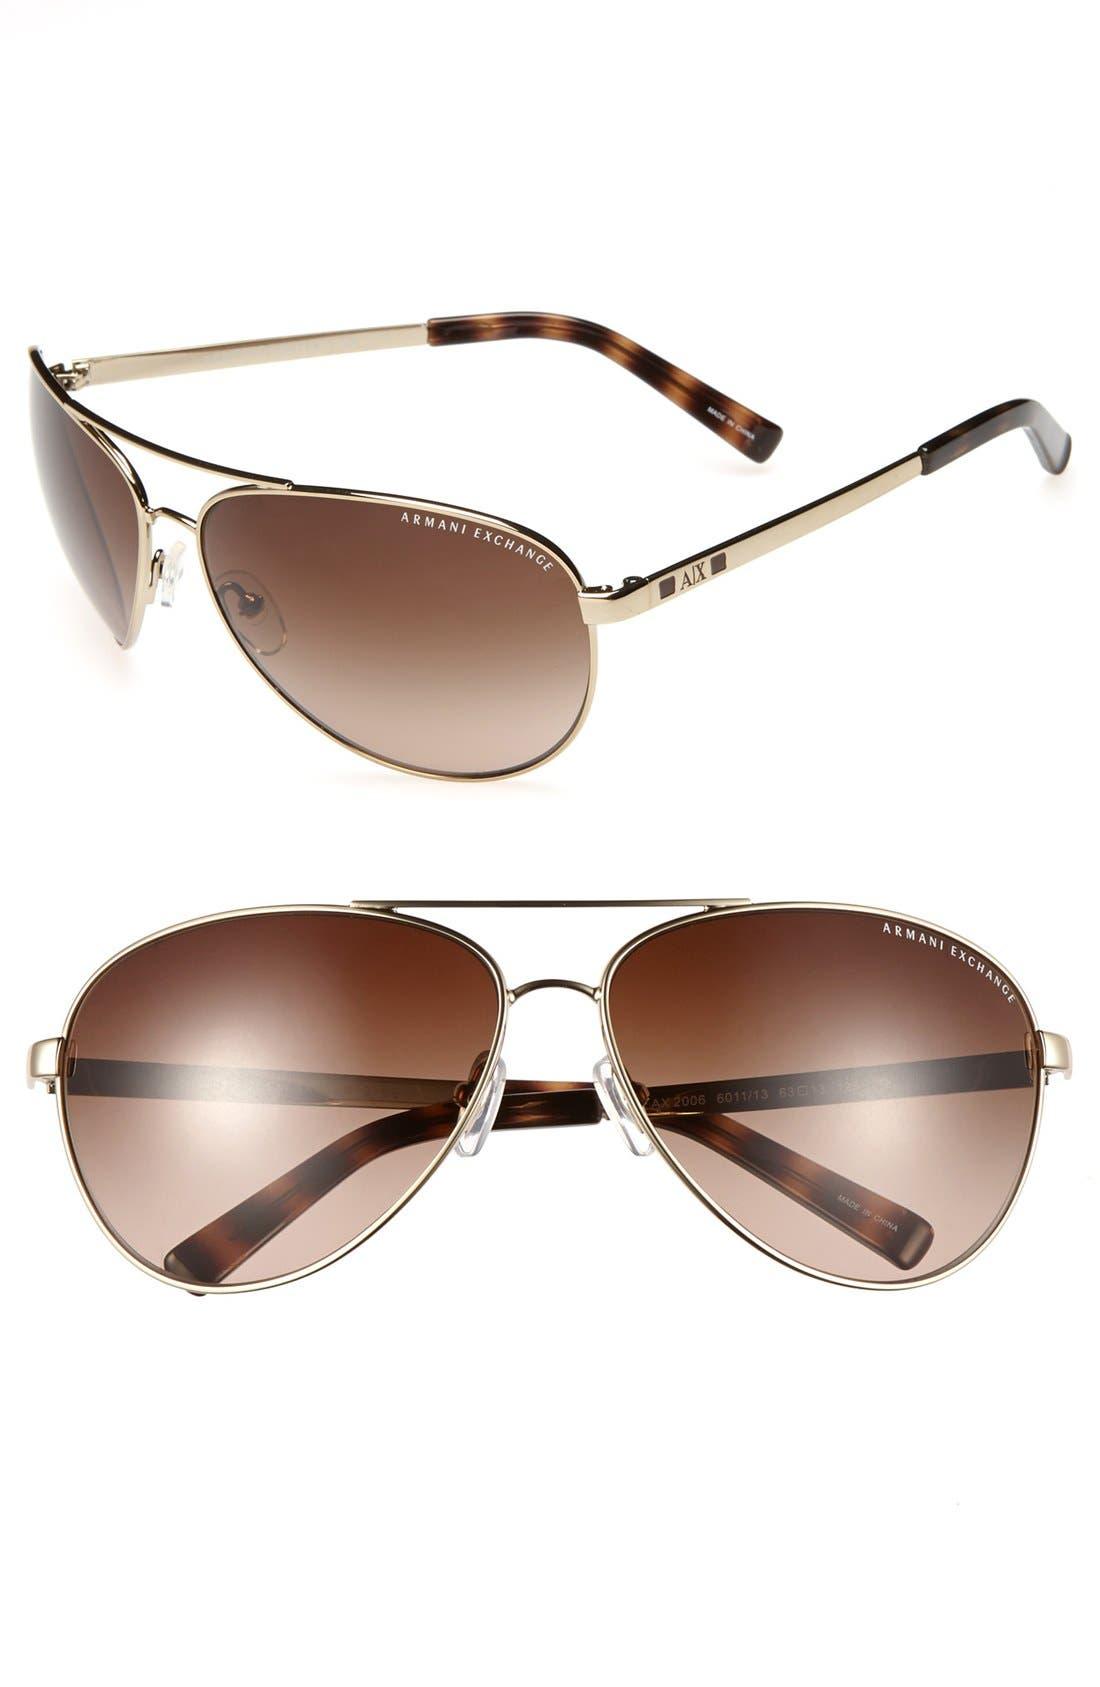 Main Image - AX Armani Exchange 63mm Aviator Sunglasses